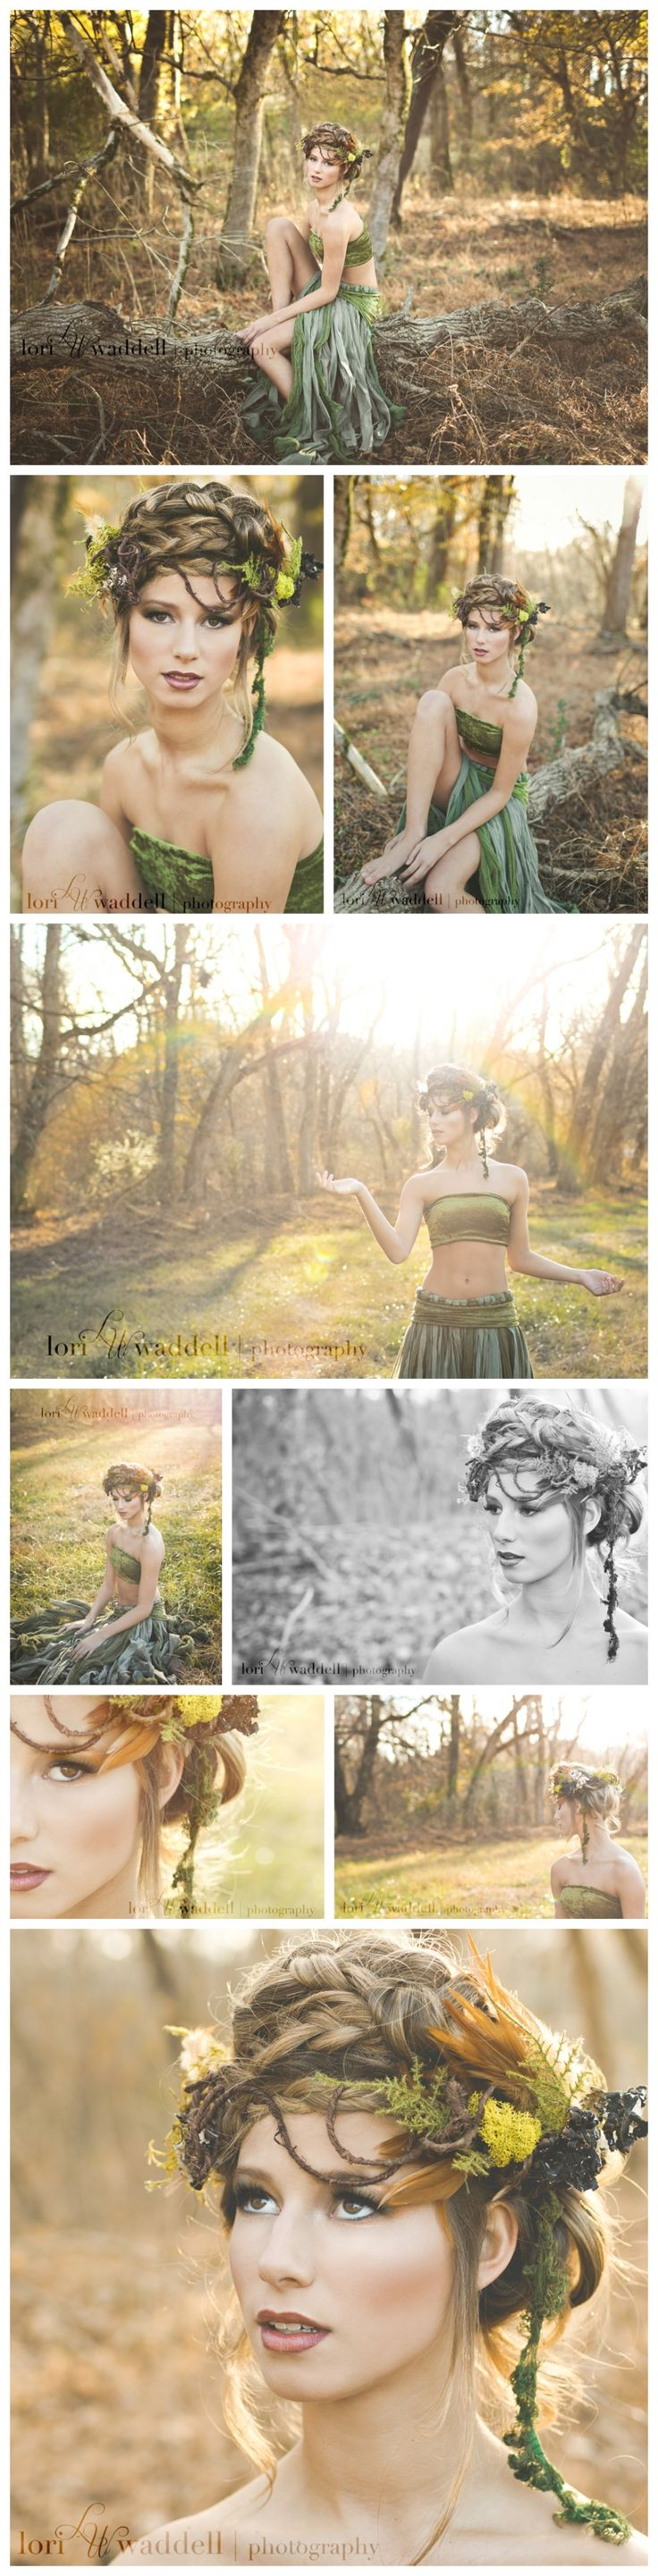 Concept Photographer Atlanta, Styled photo session Atlanta | Marietta, | Lori Waddell Photography